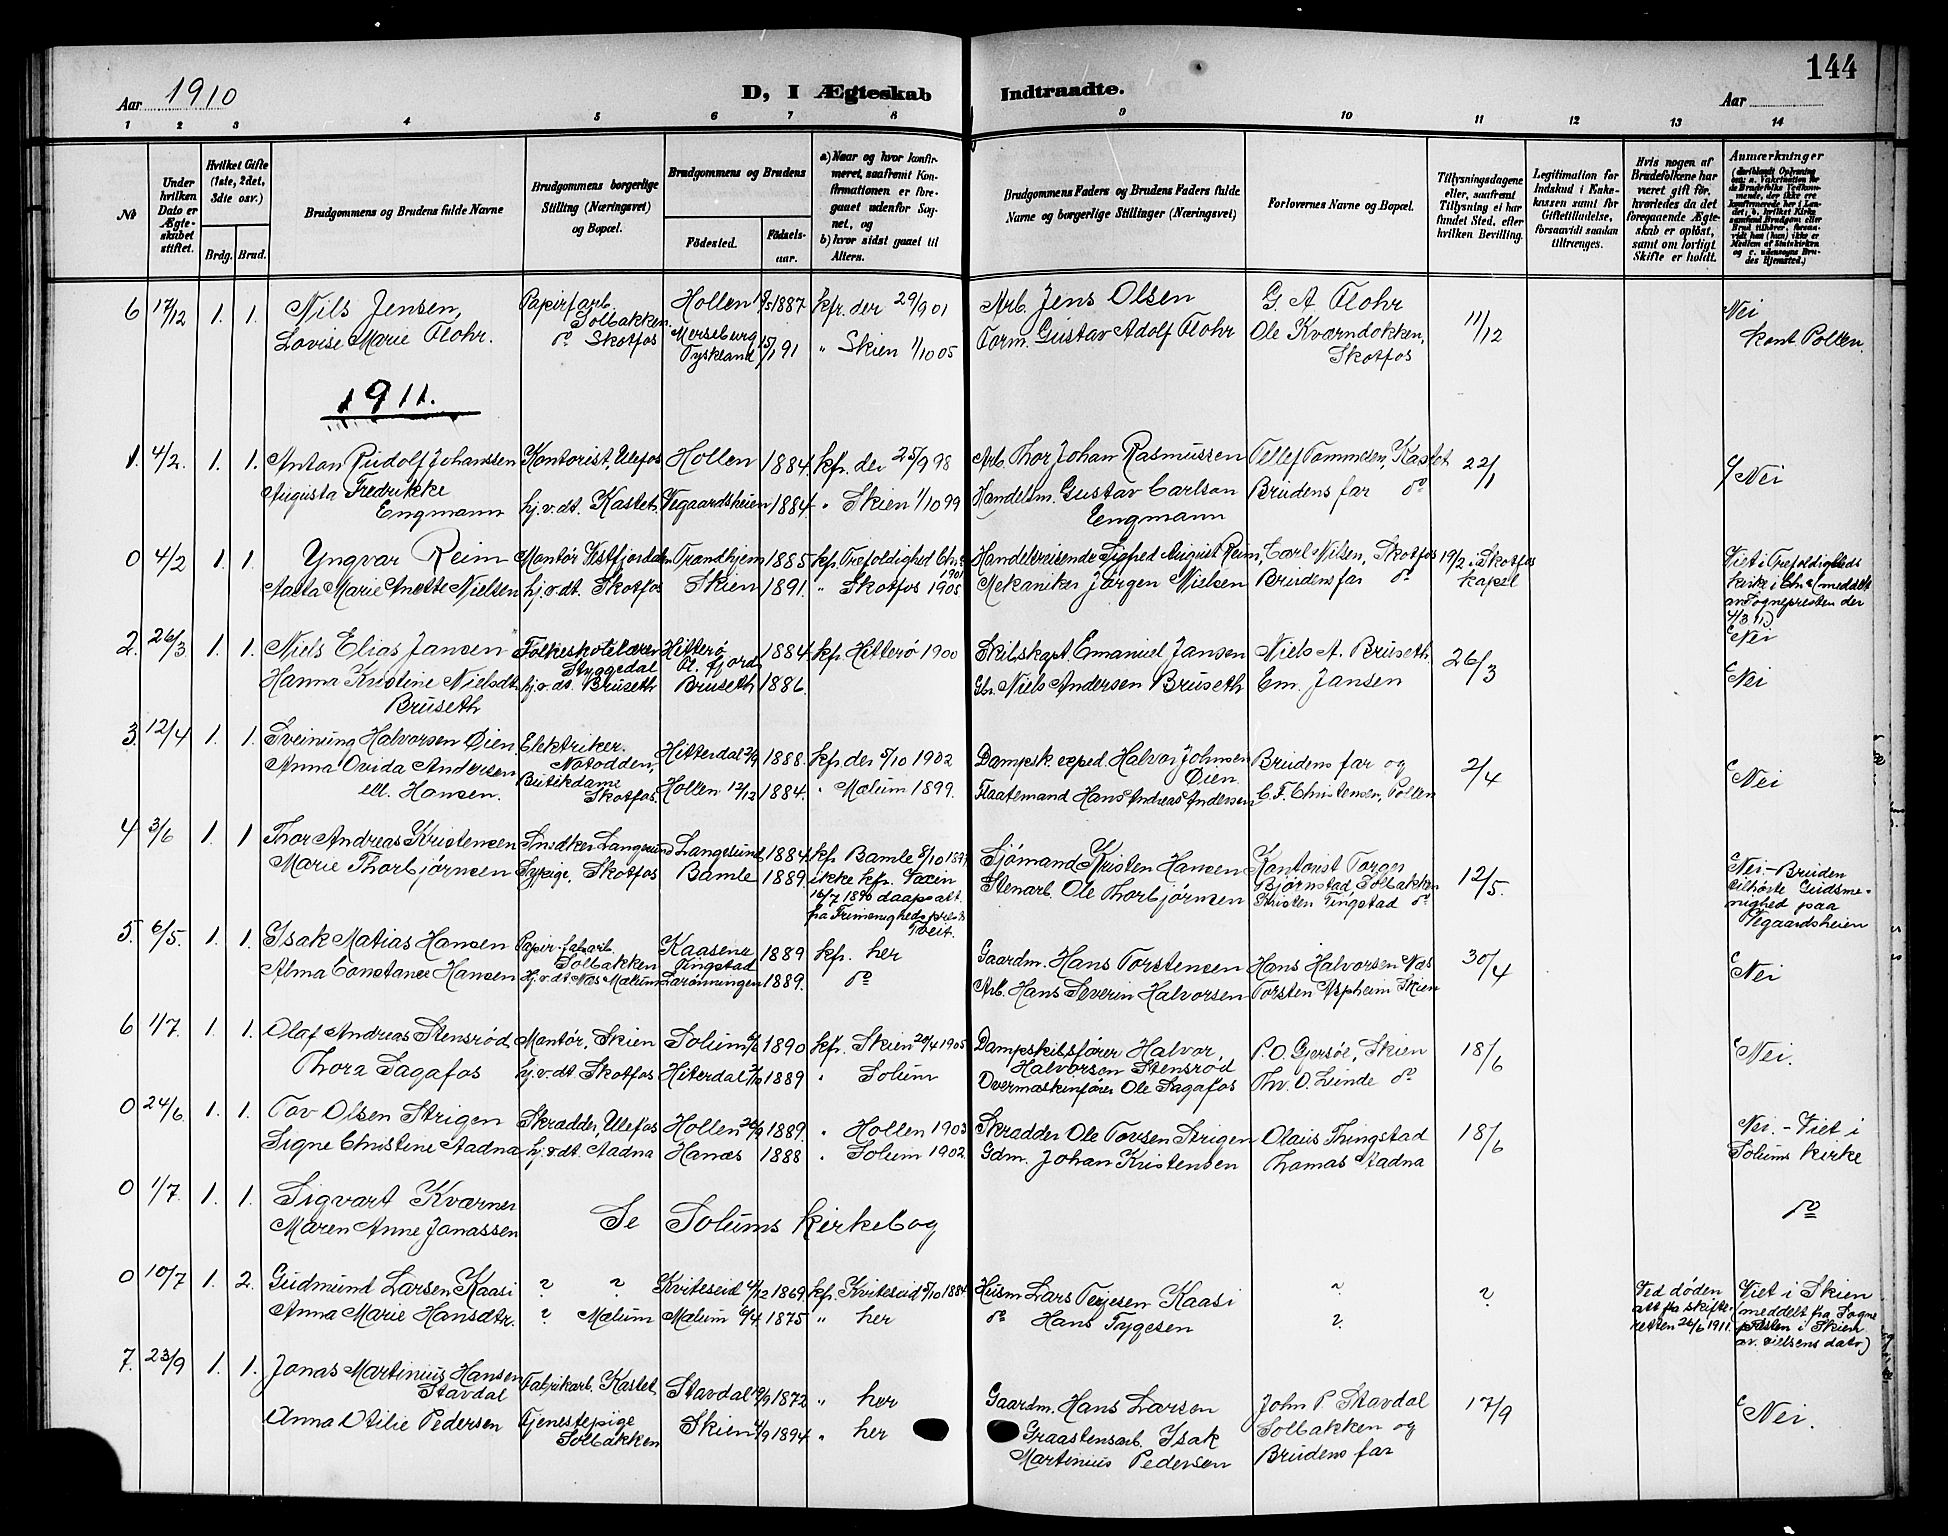 SAKO, Solum kirkebøker, G/Gb/L0005: Klokkerbok nr. II 5, 1905-1914, s. 144